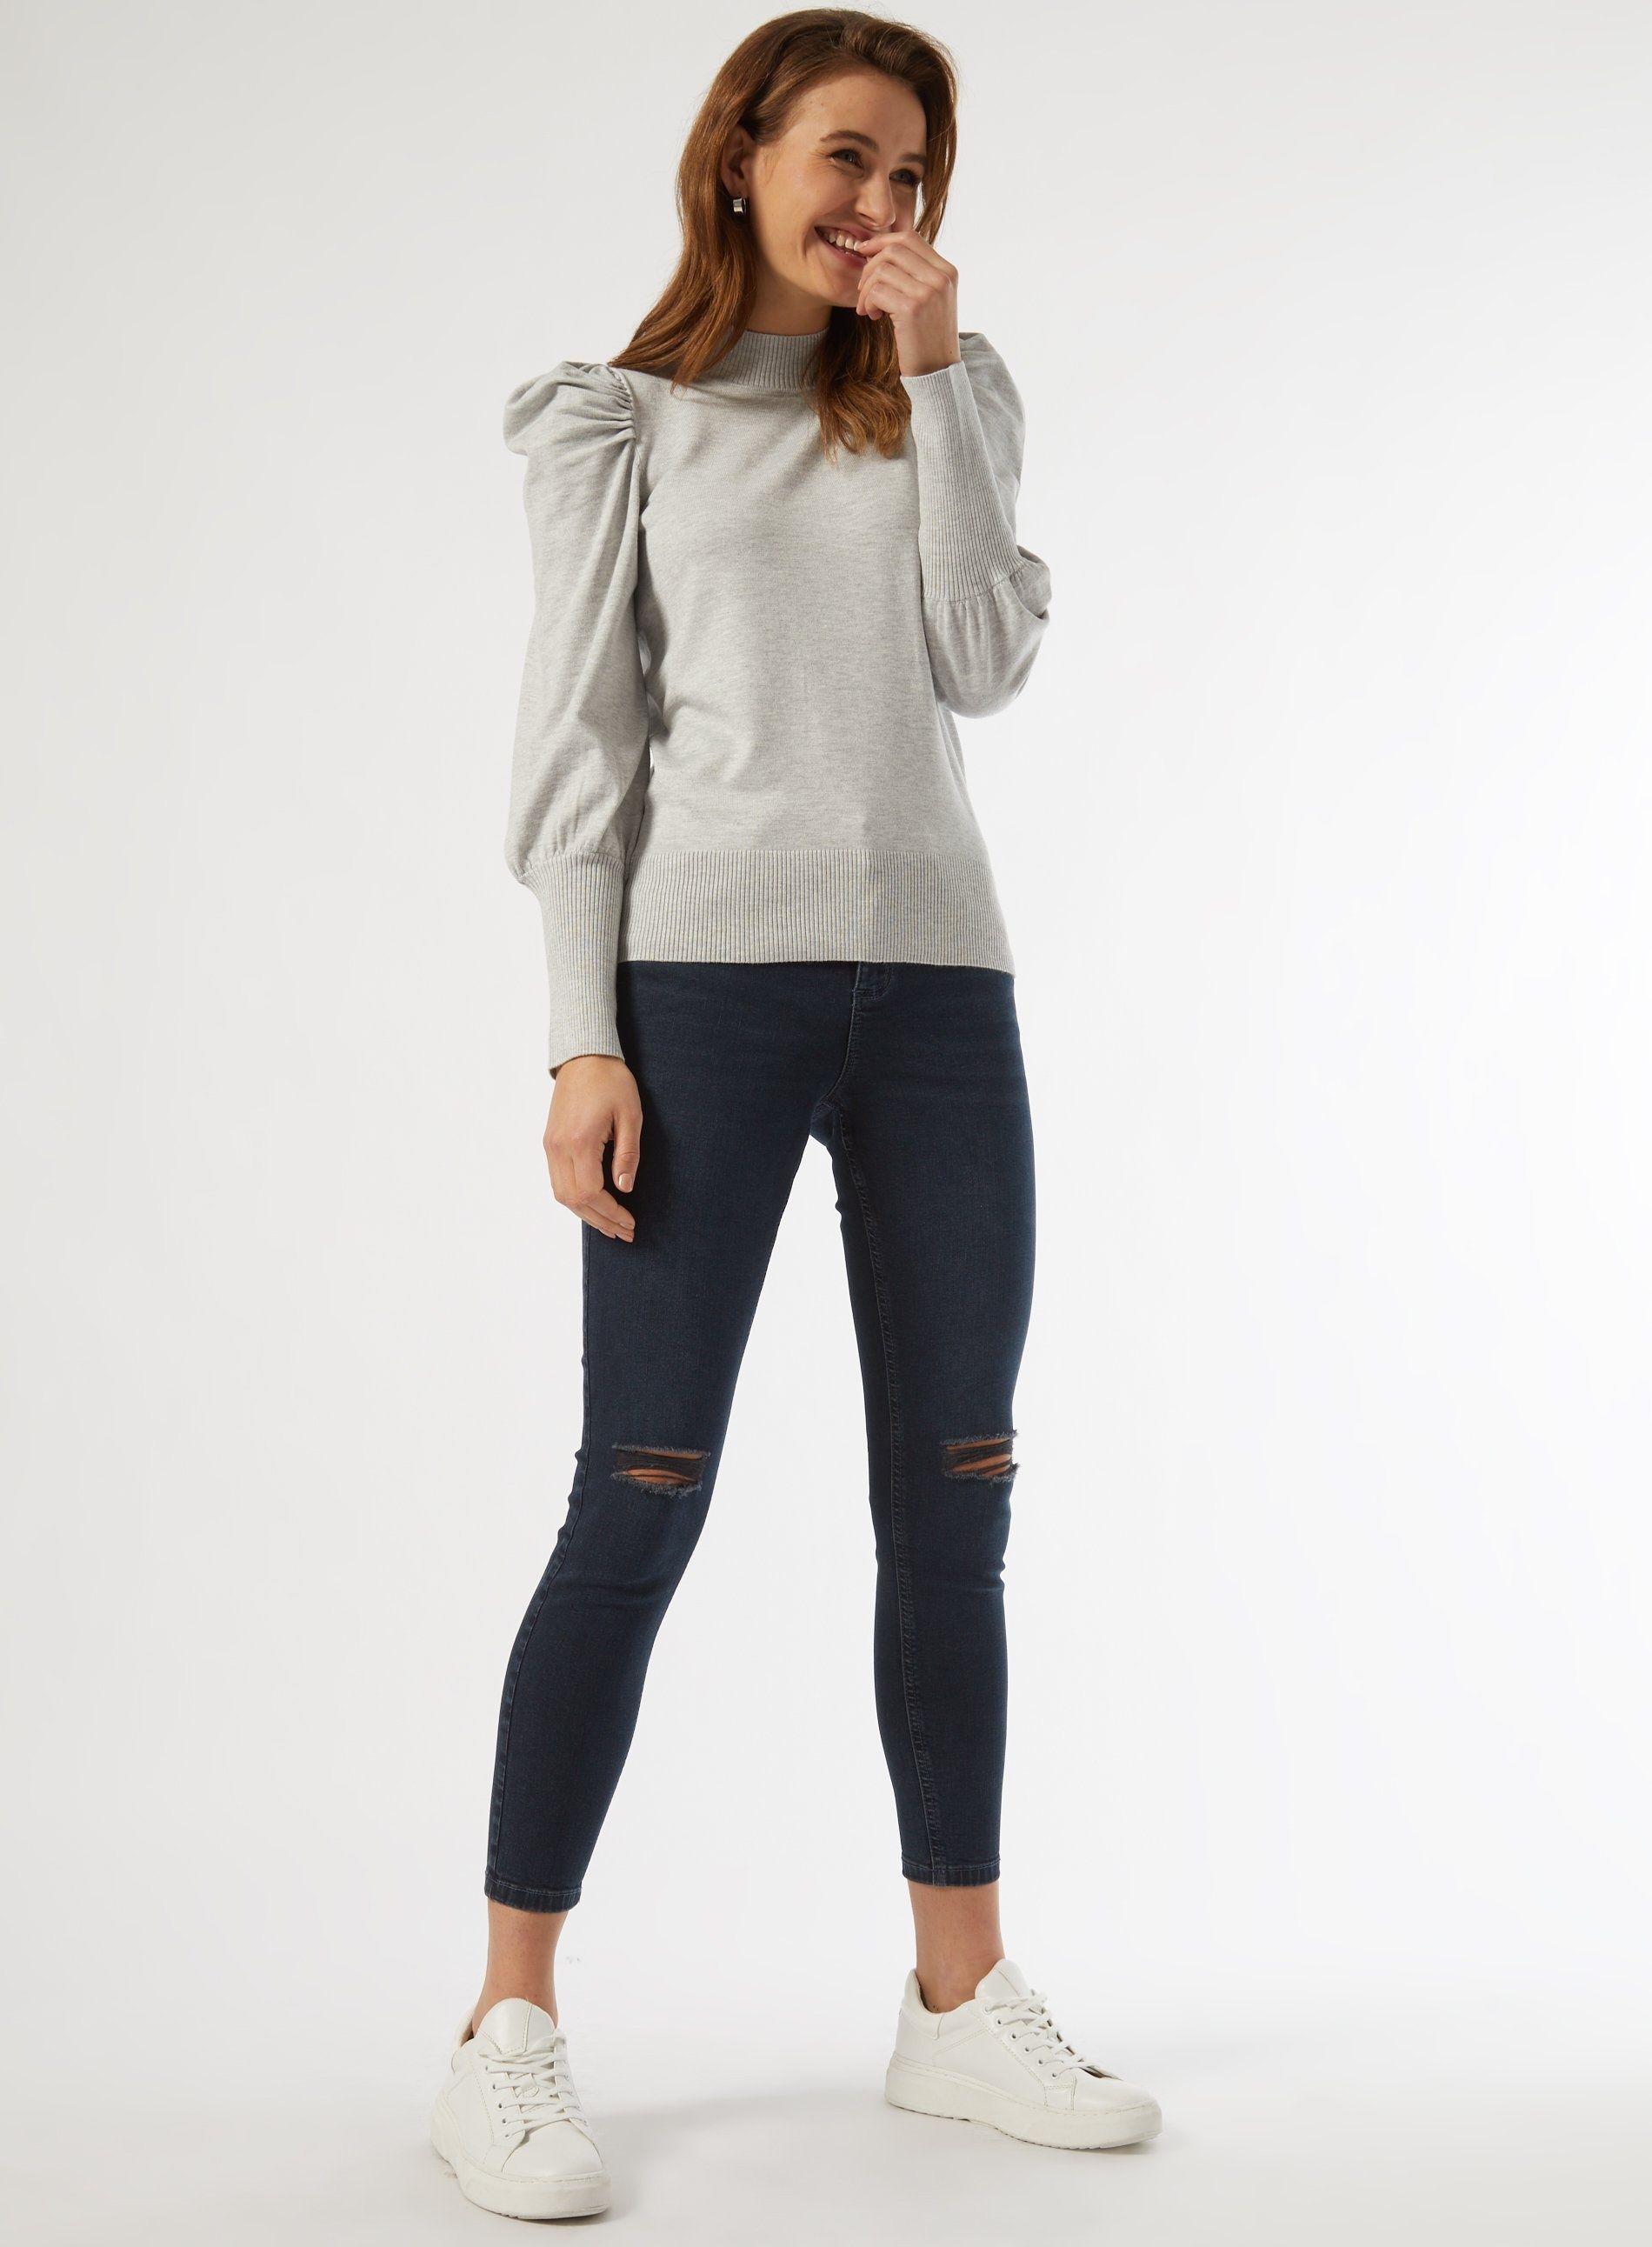 Dorothy Perkins Womens Grey Marl Volume Sleeve Jumper Sweater Pullover Knitwear